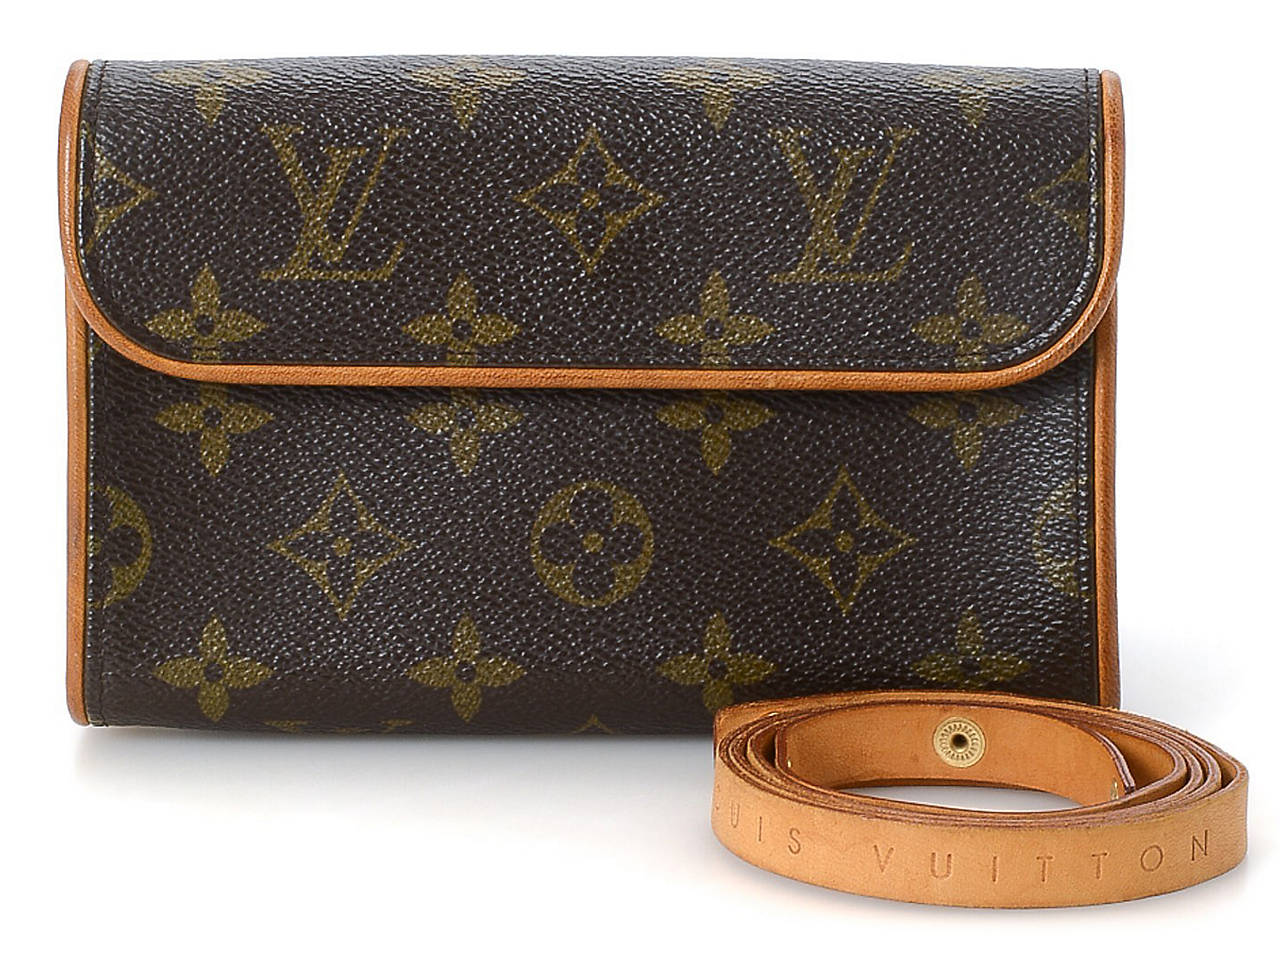 63cf10390dee Louis Vuitton - Vintage Luxury Pochette Florentine Belt Bag Women s ...